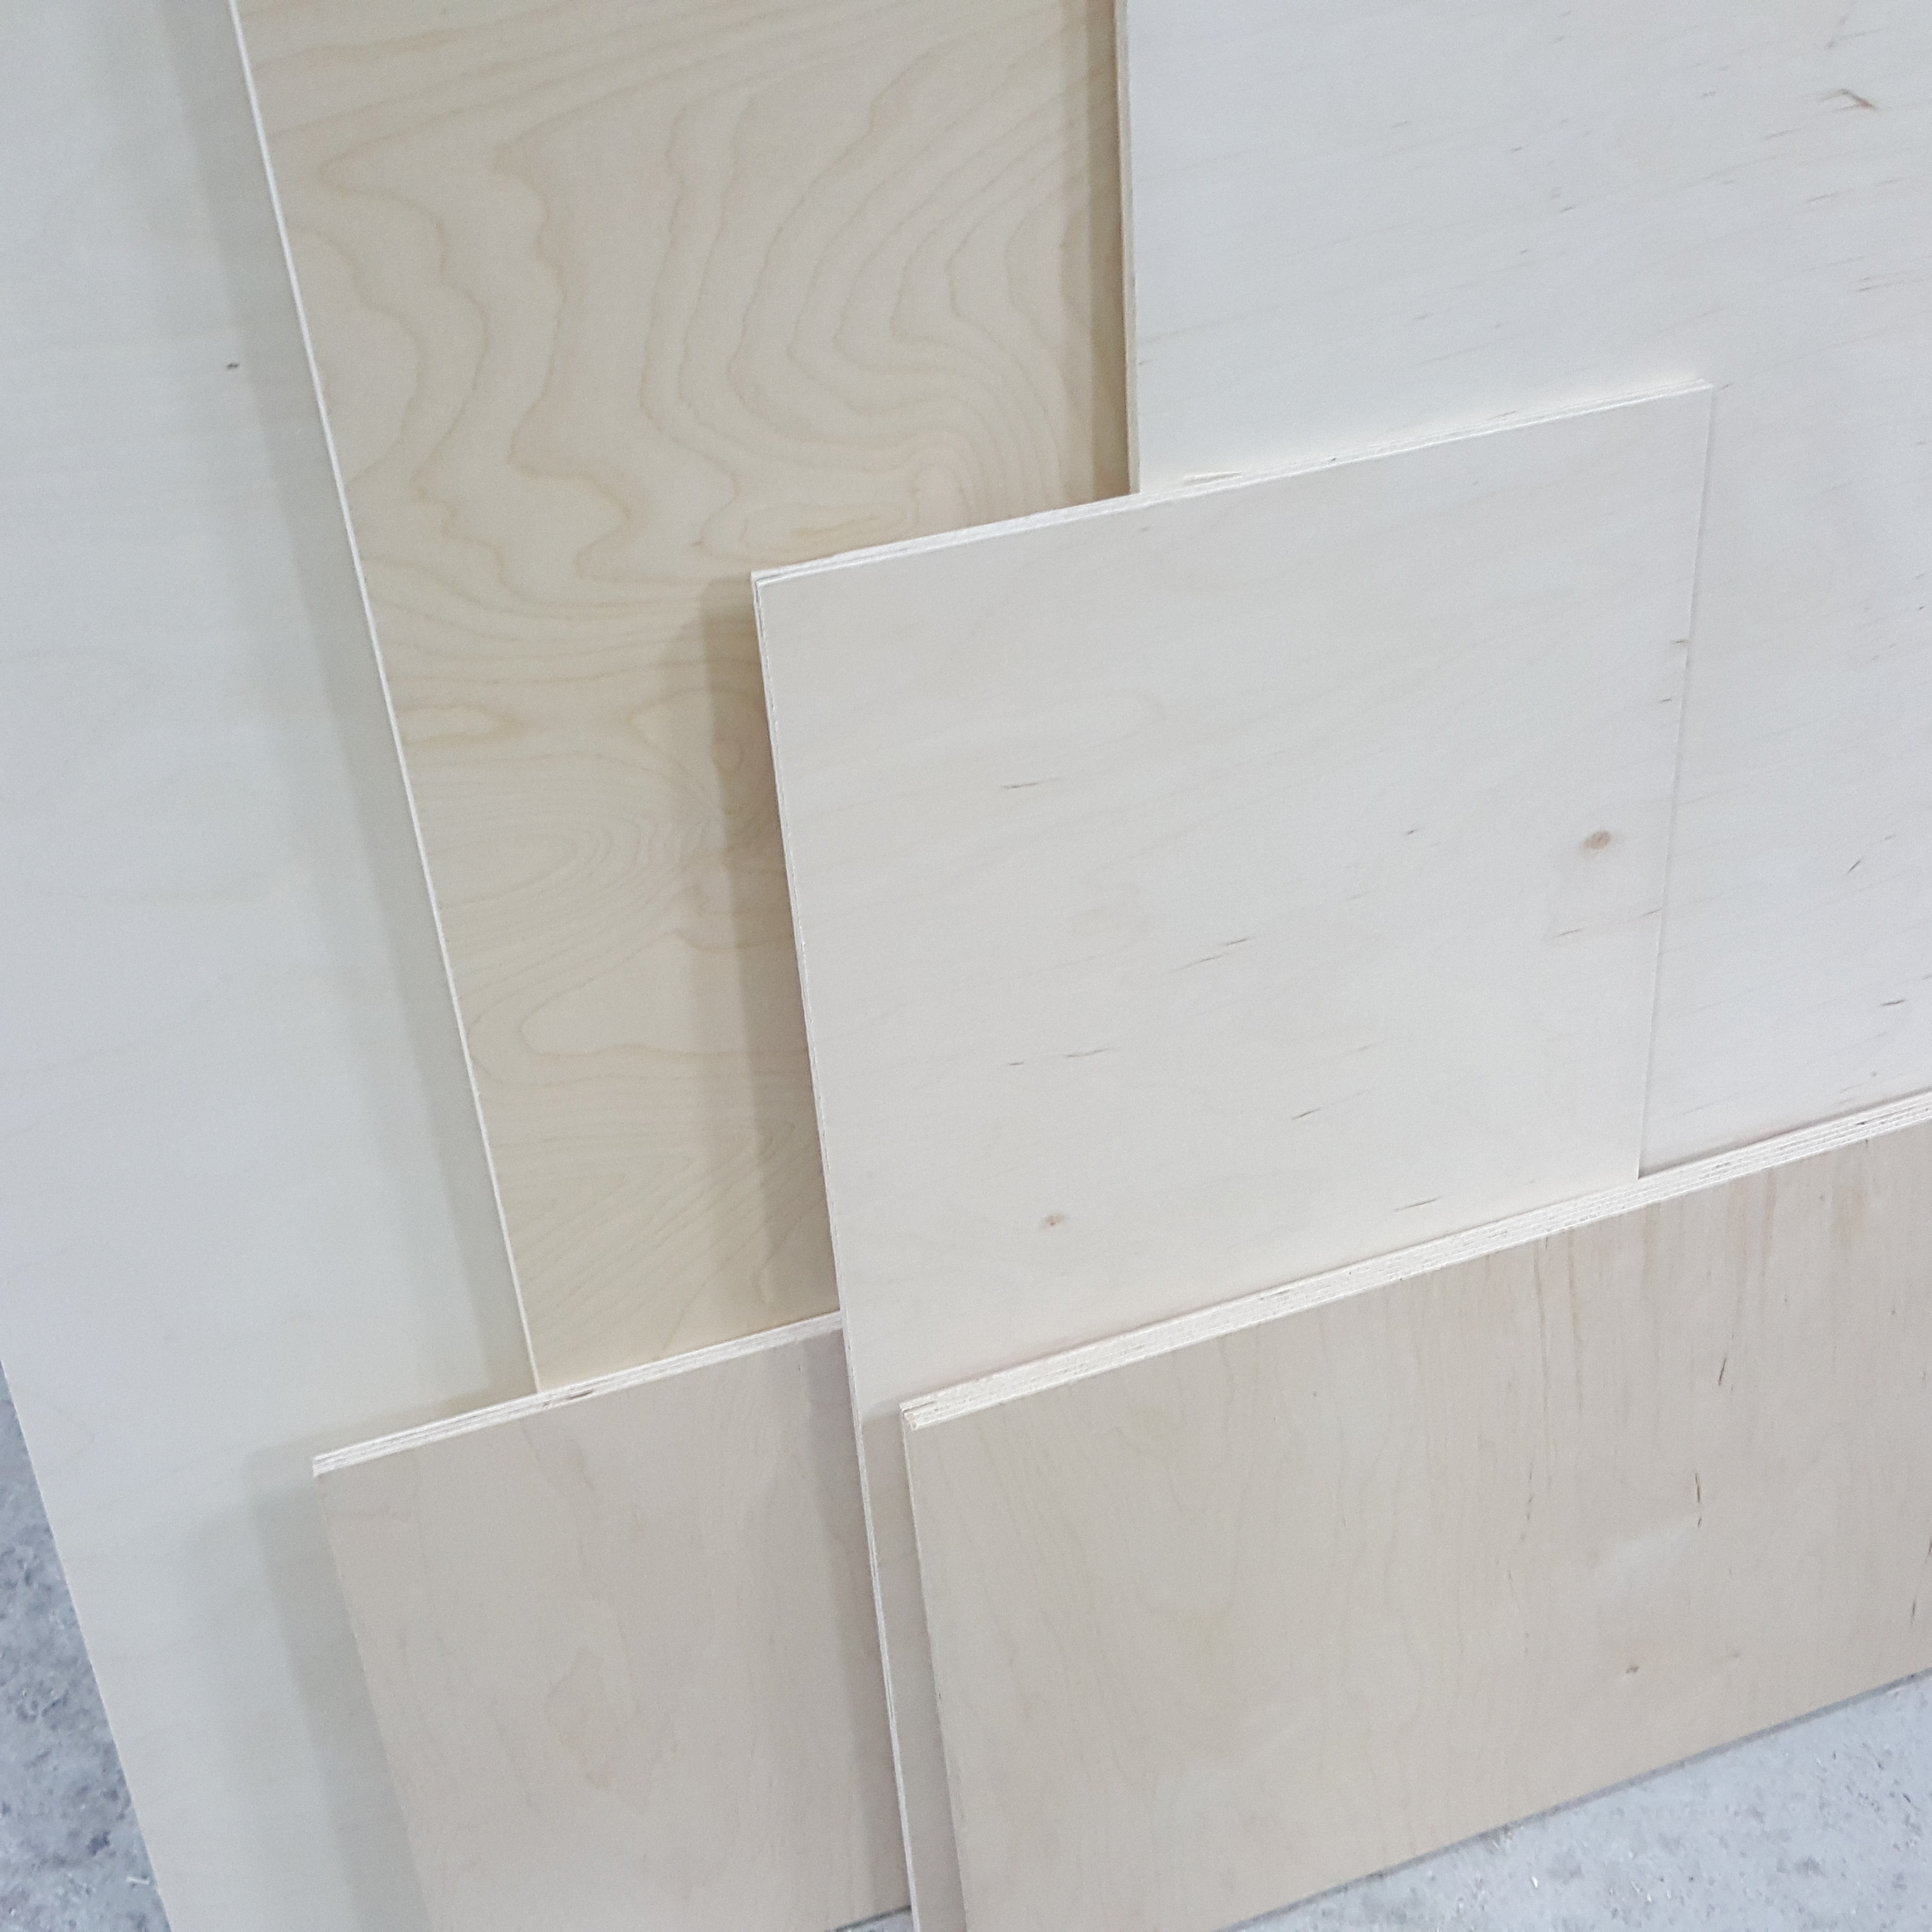 180x120 cm 12mm Multiplex Zuschnitt L/änge bis 200cm Multiplexplatten Zuschnitte Auswahl